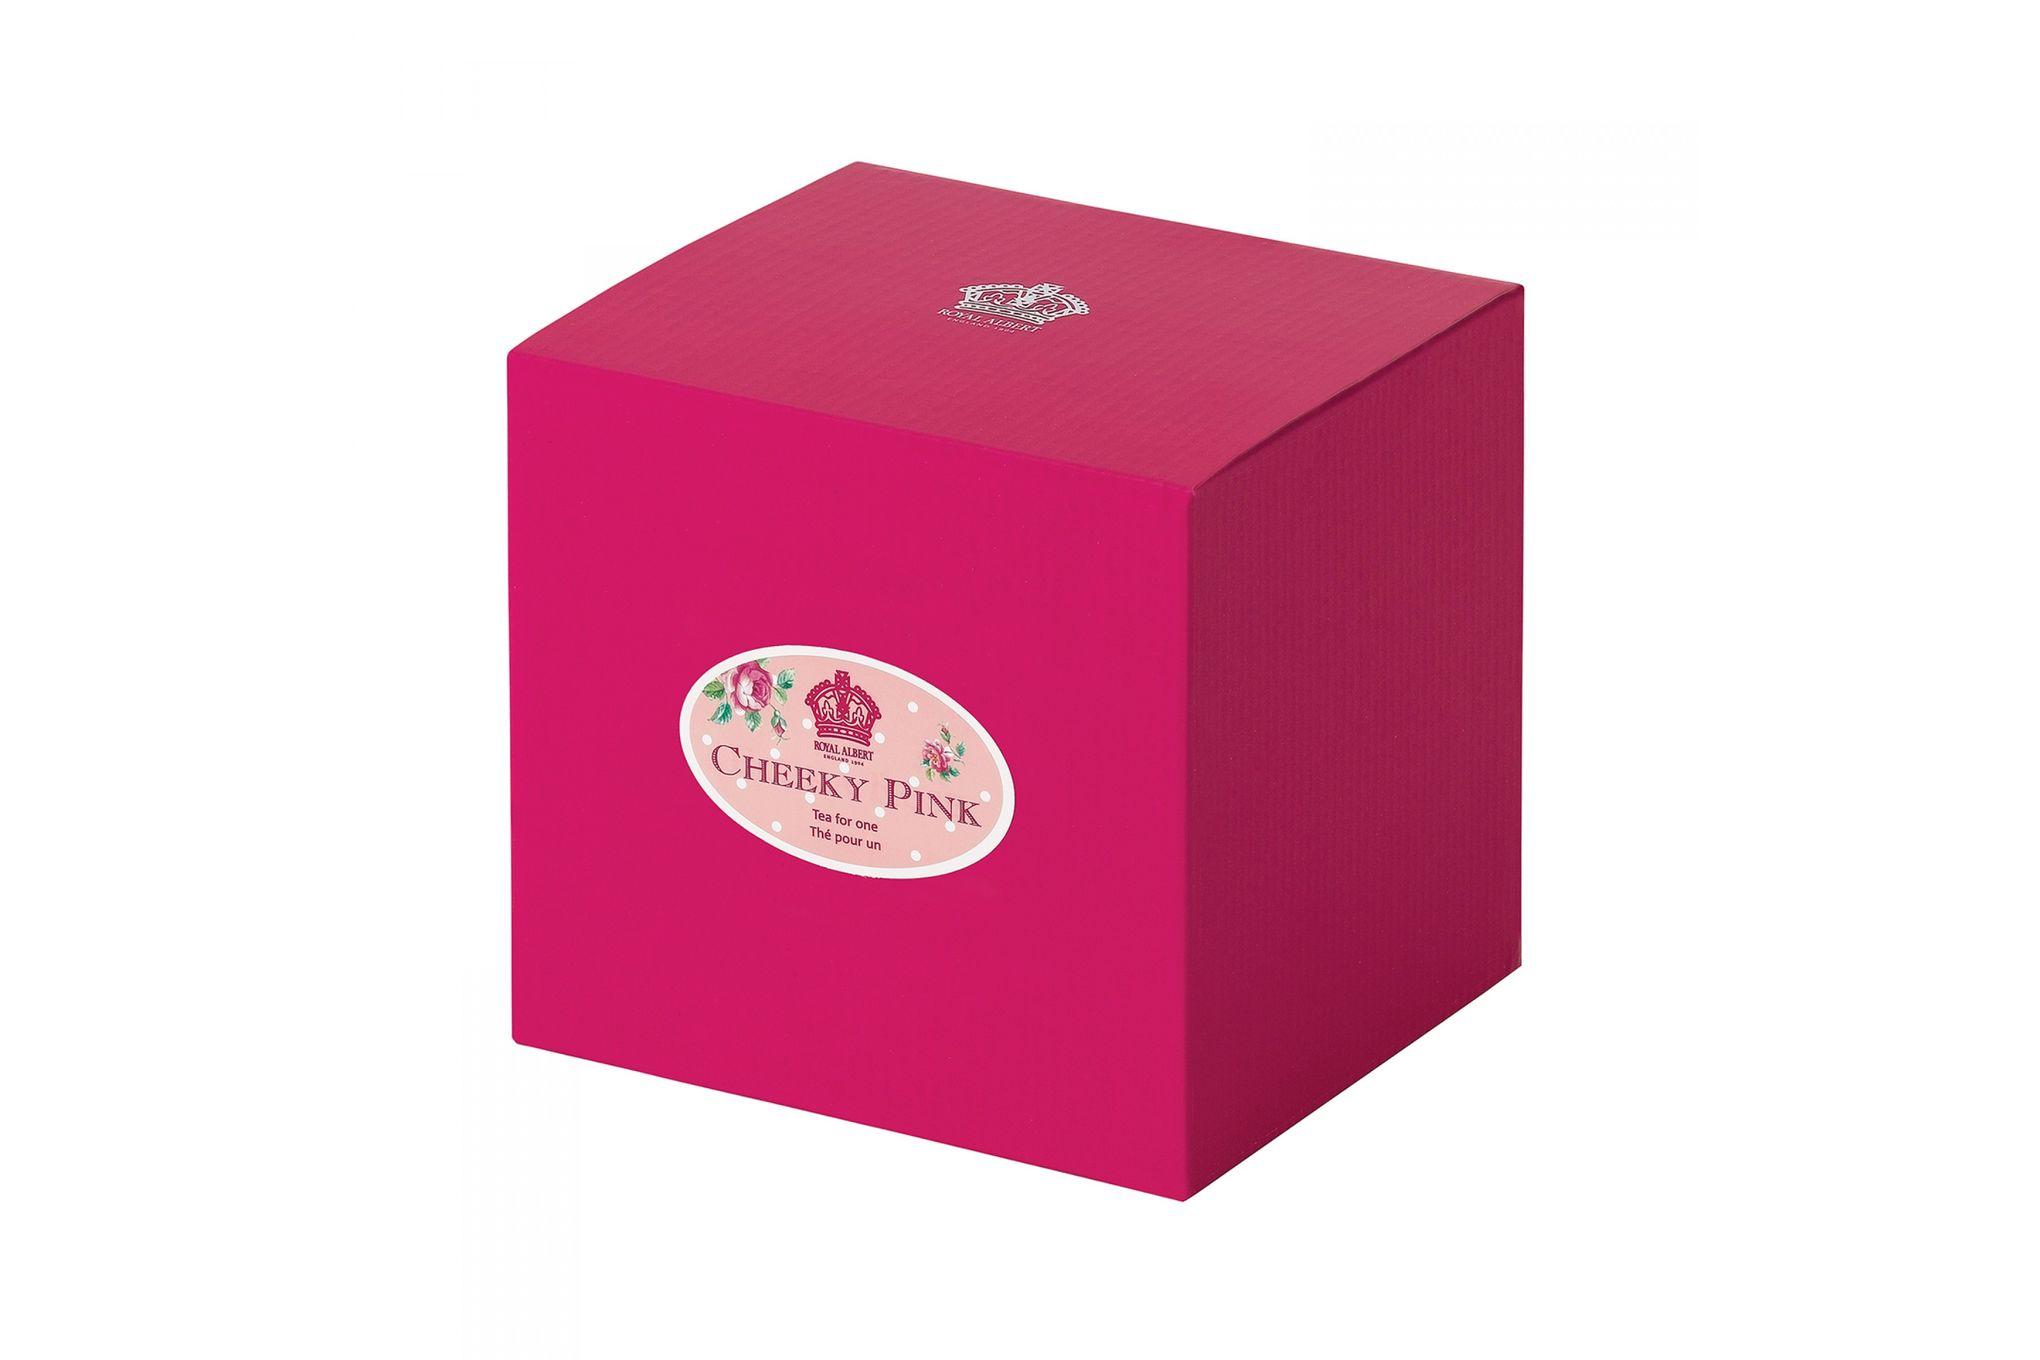 Royal Albert Cheeky Pink Tea For One Vintage Shape - Gift Boxed thumb 2